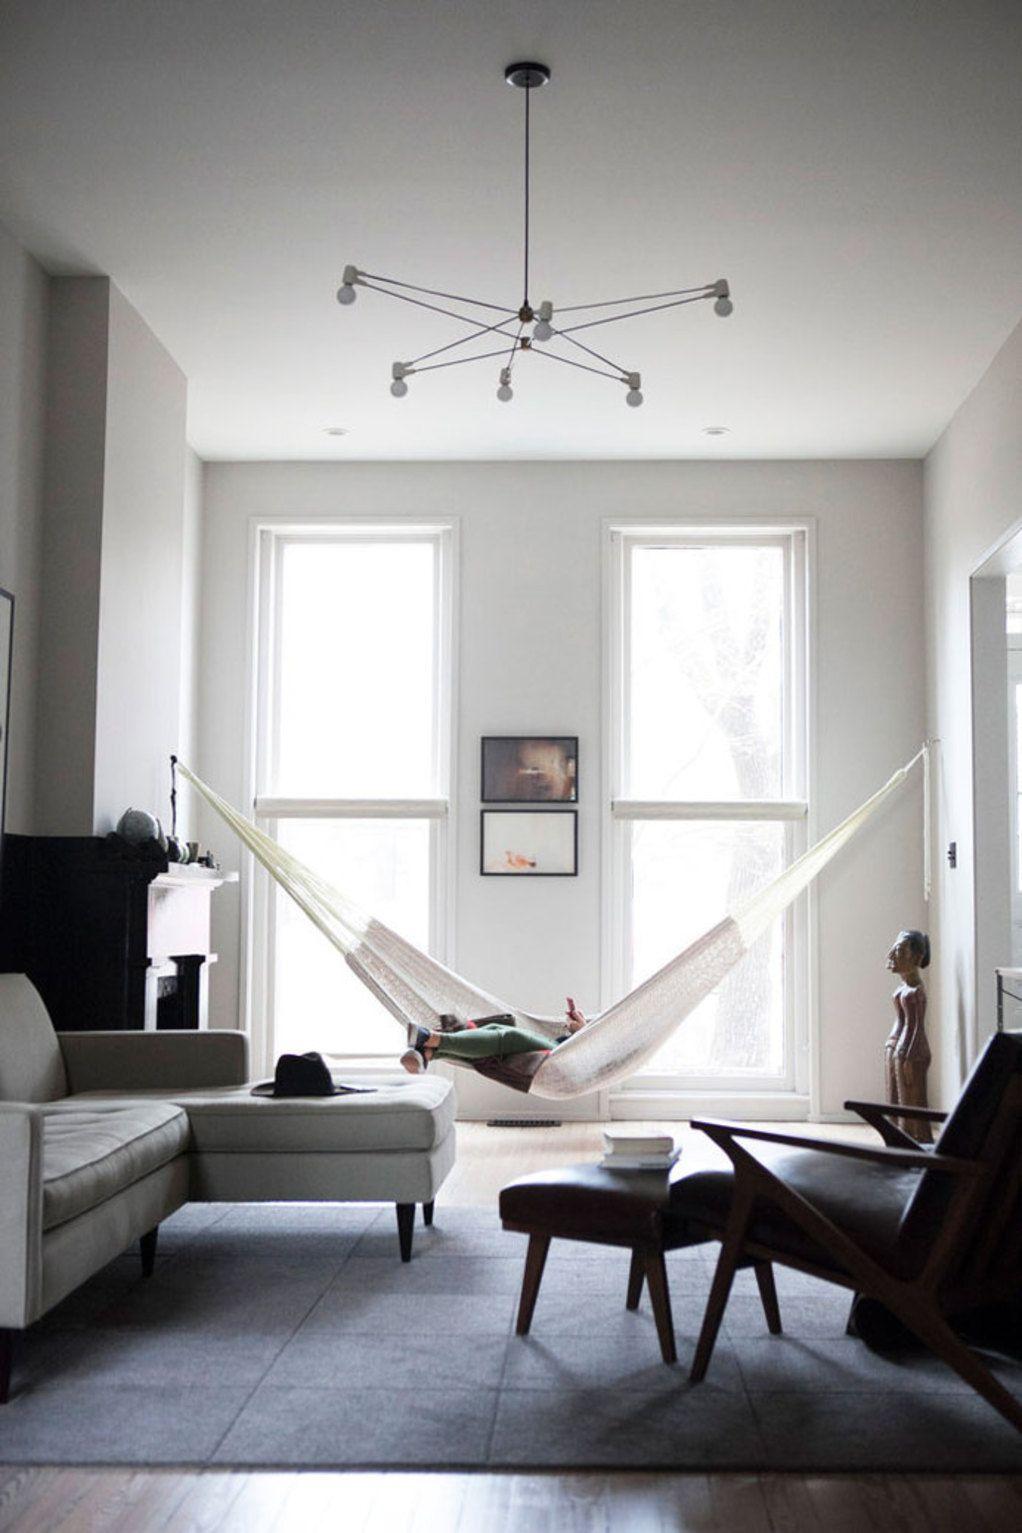 20 Examples Of Minimal Interior Design #15 | UltraLinx | Interiors ...